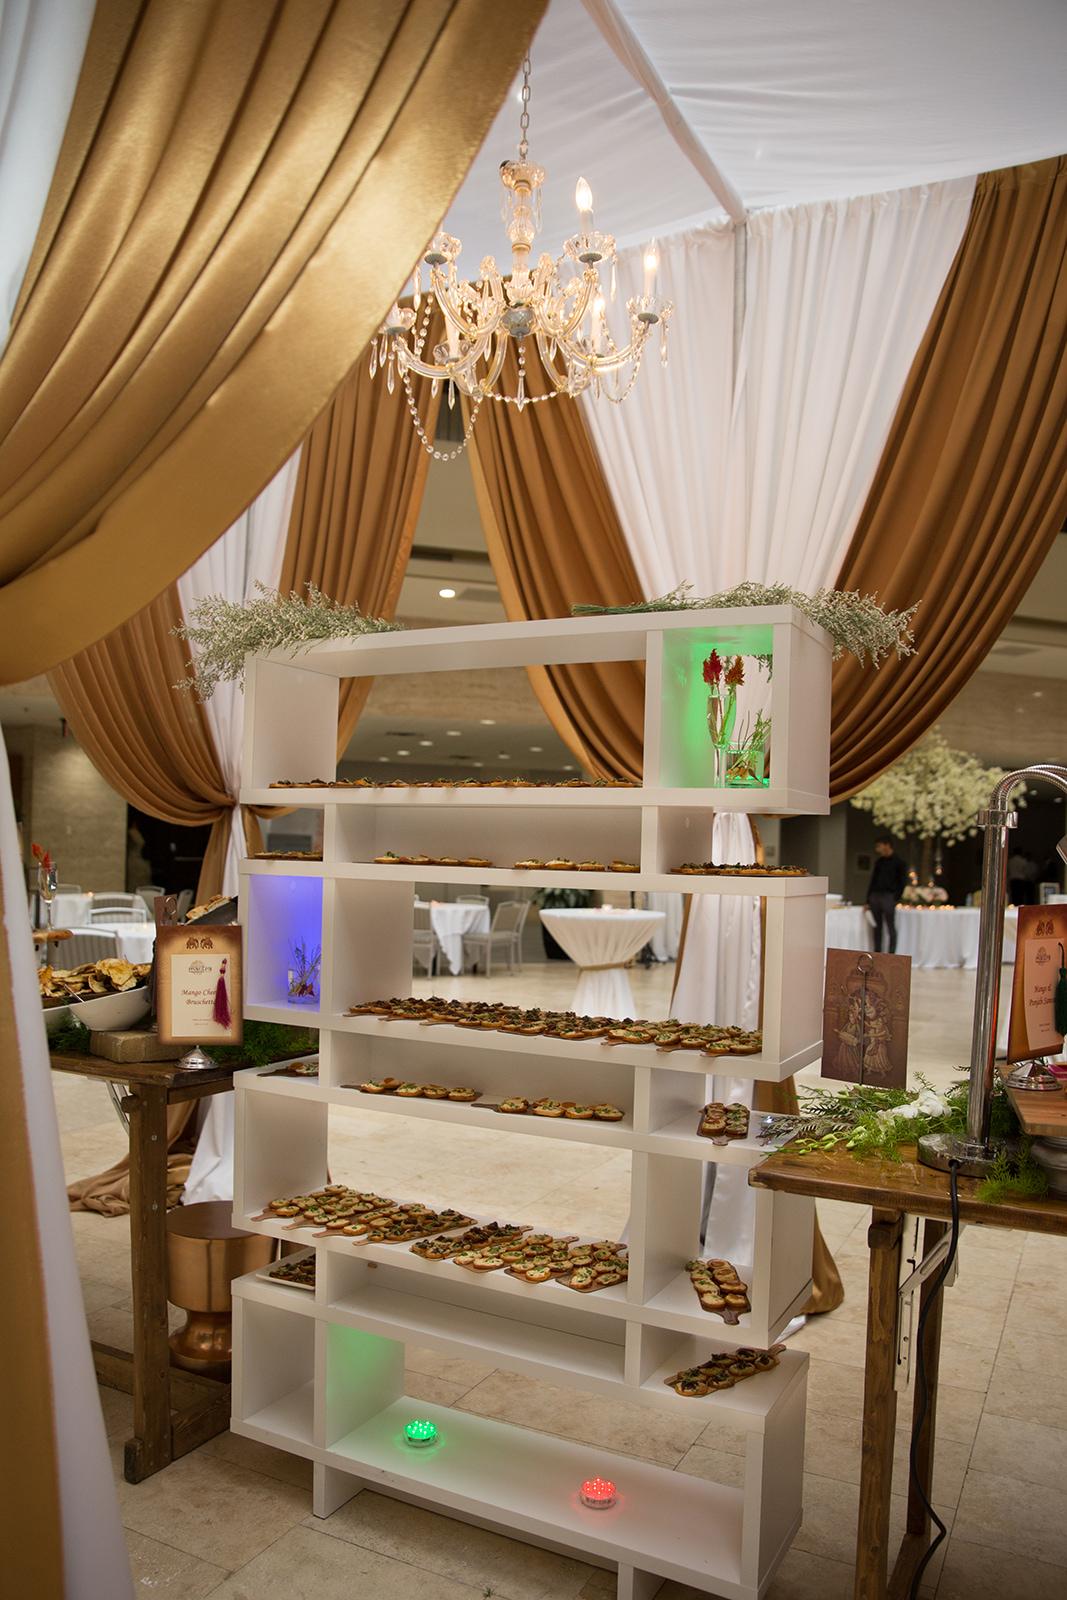 Le Cape Weddings - Sumeet and Chavi - Reception Details  -4.jpg